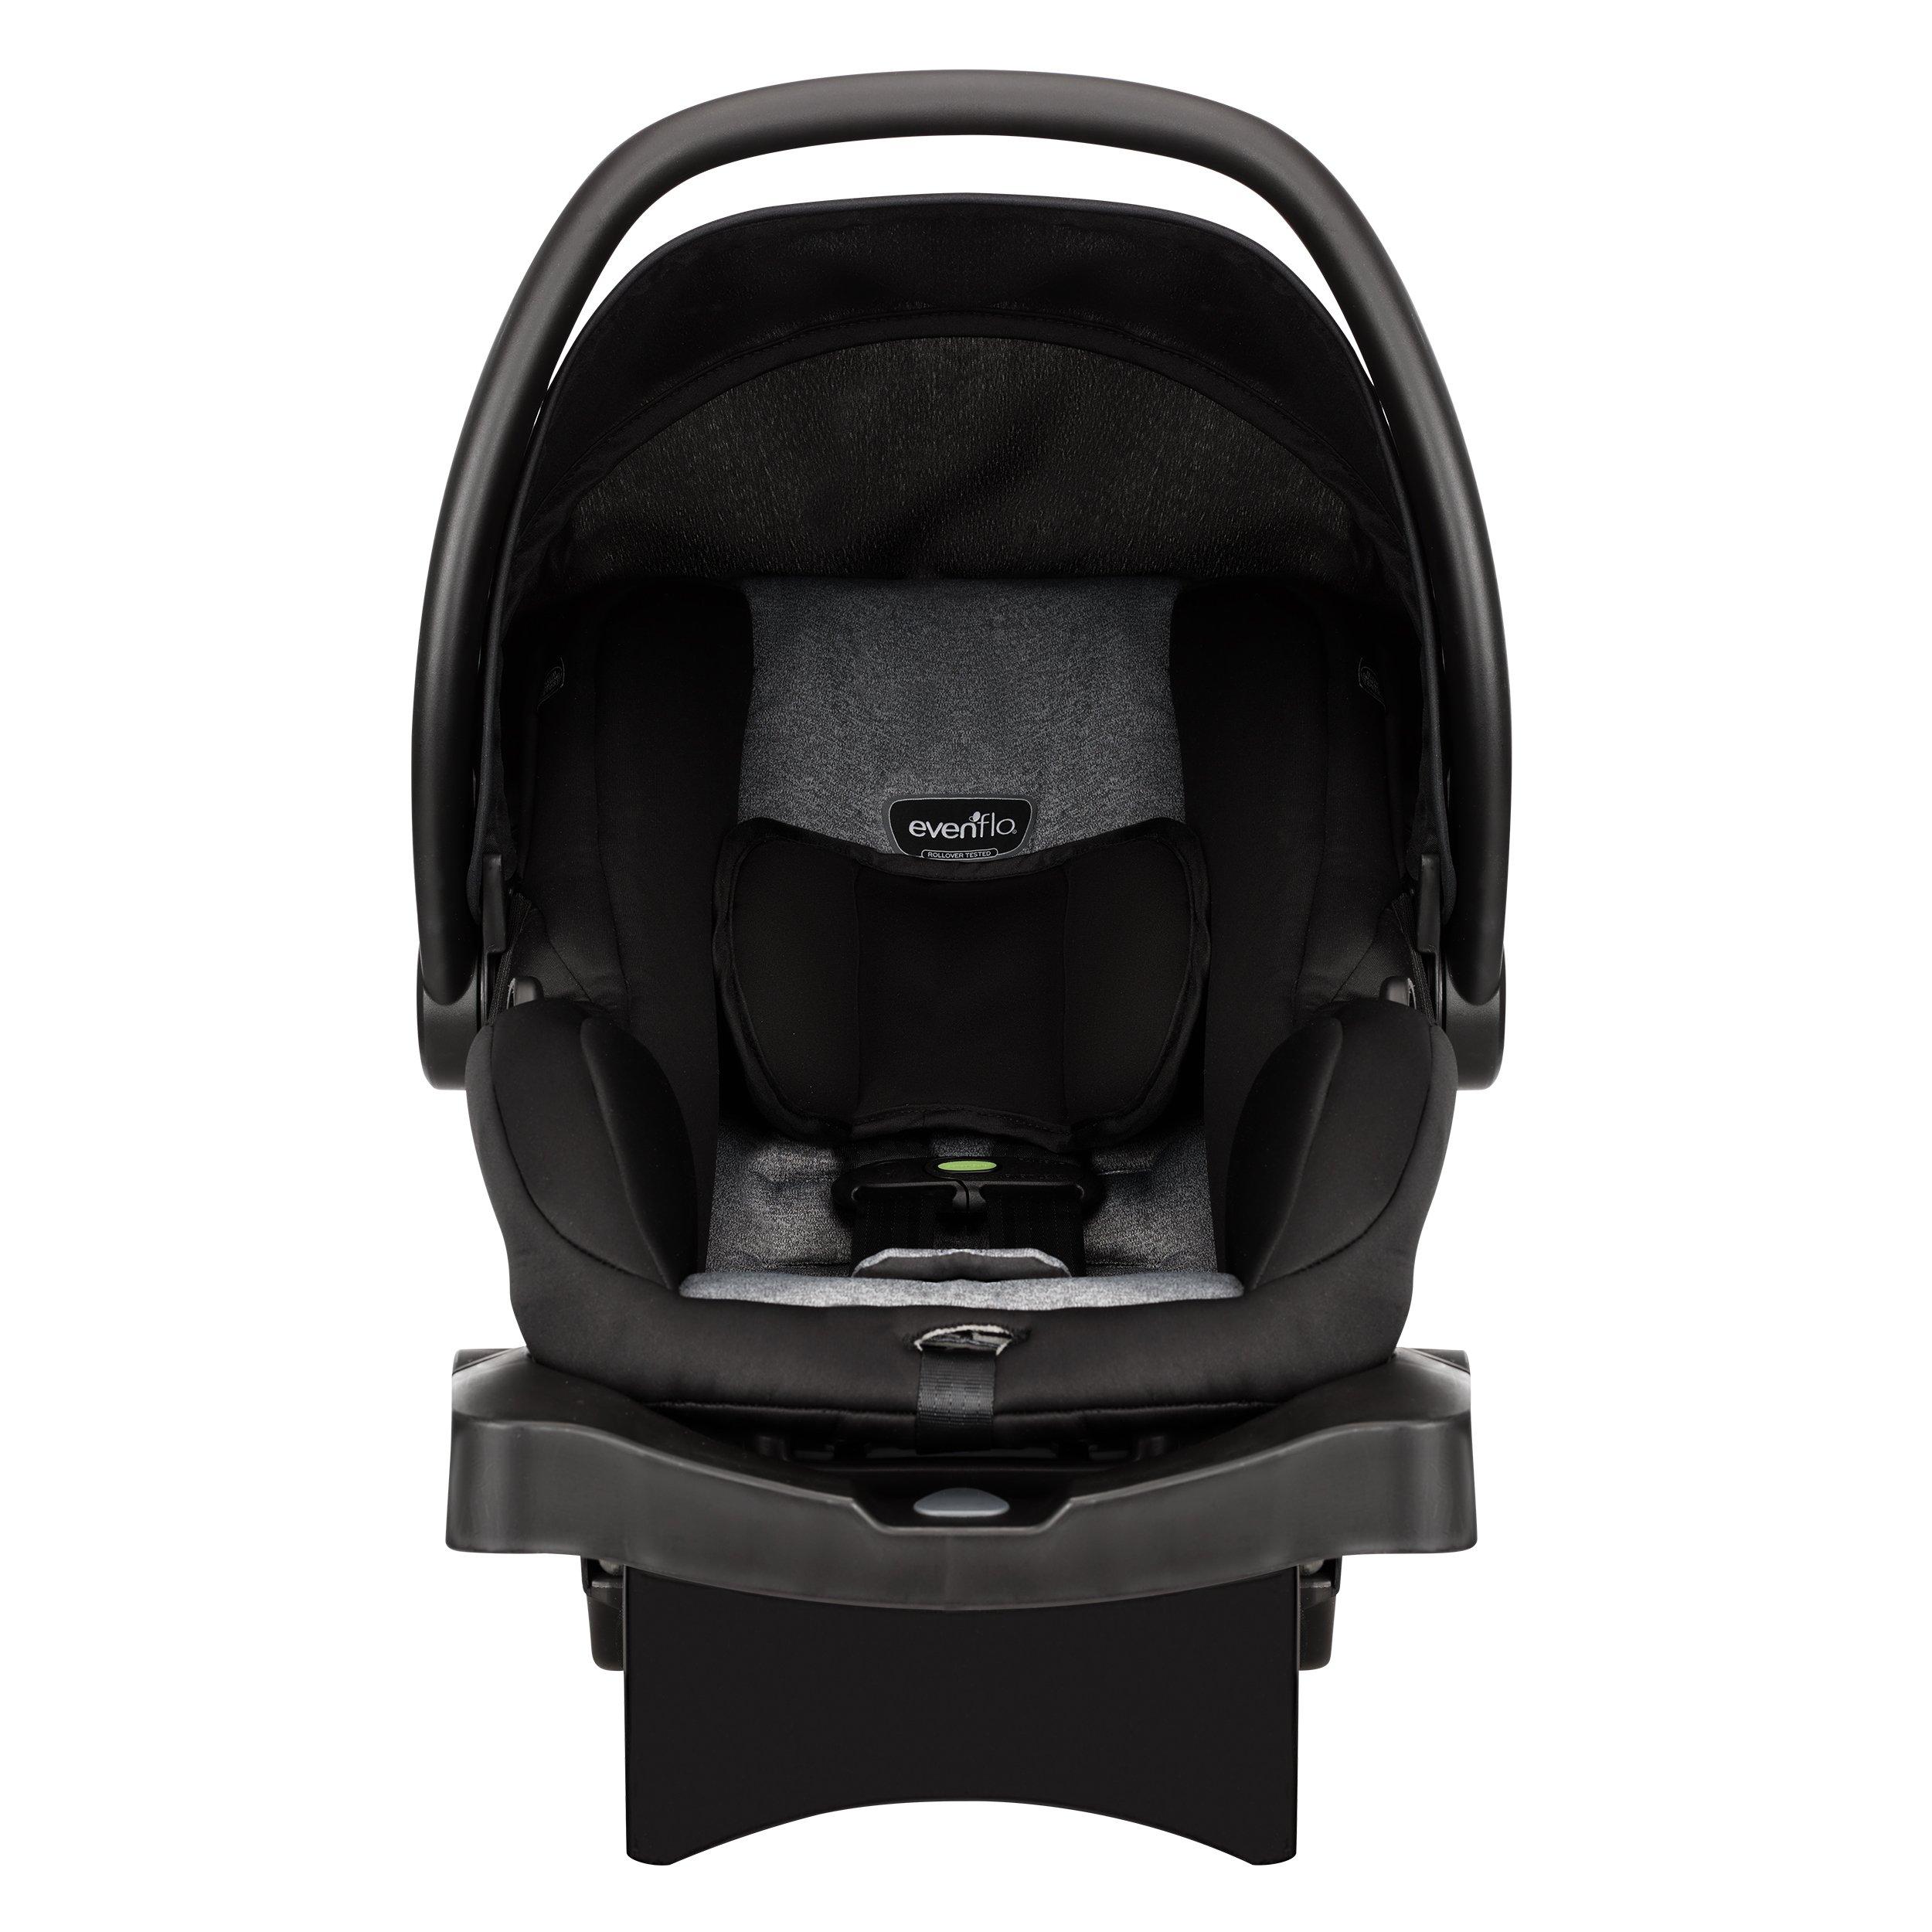 Evenflo Advanced SensorSafe Epic Travel System with LiteMax Infant Car Seat, Jet by Evenflo (Image #2)